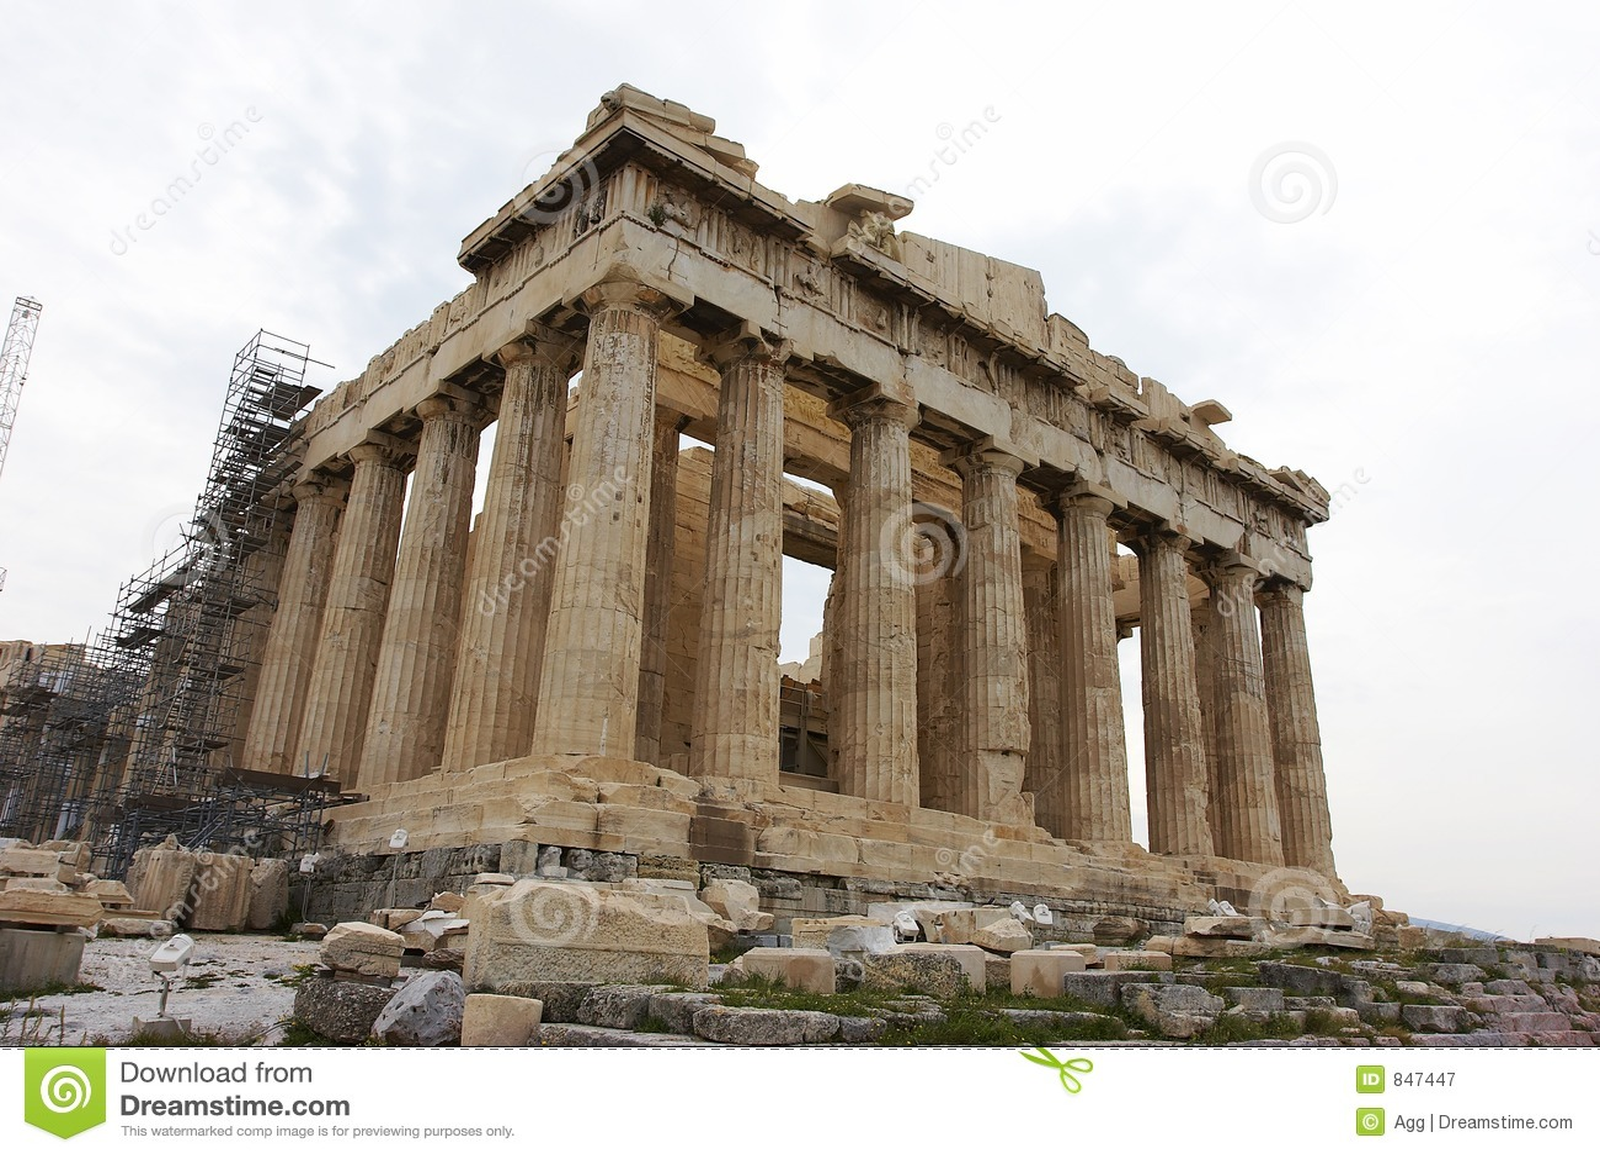 Acropolis Undergoing Reconstruction